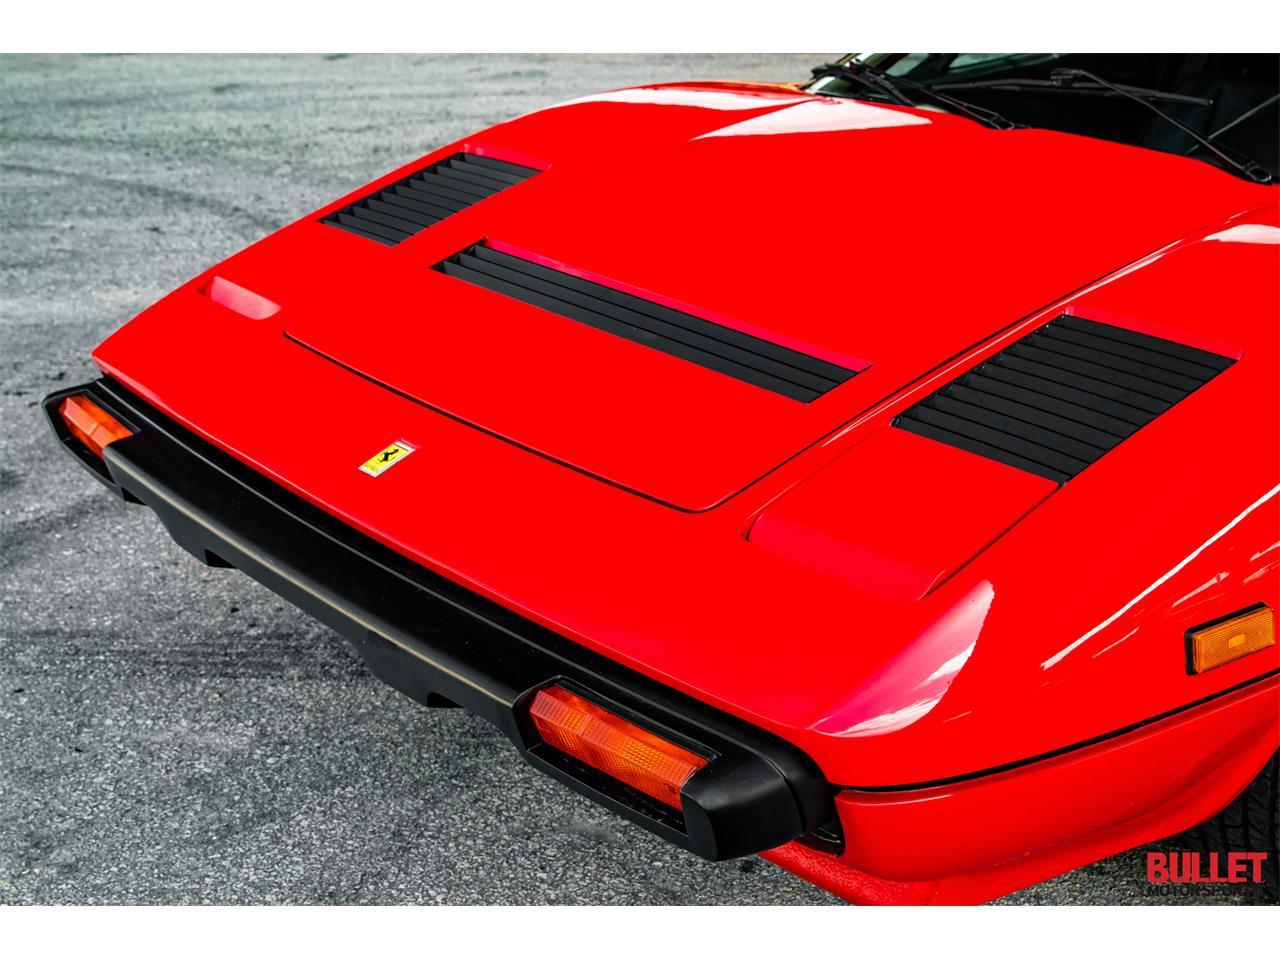 1985 Ferrari 308 GTS (CC-1237804) for sale in Fort Lauderdale, Florida